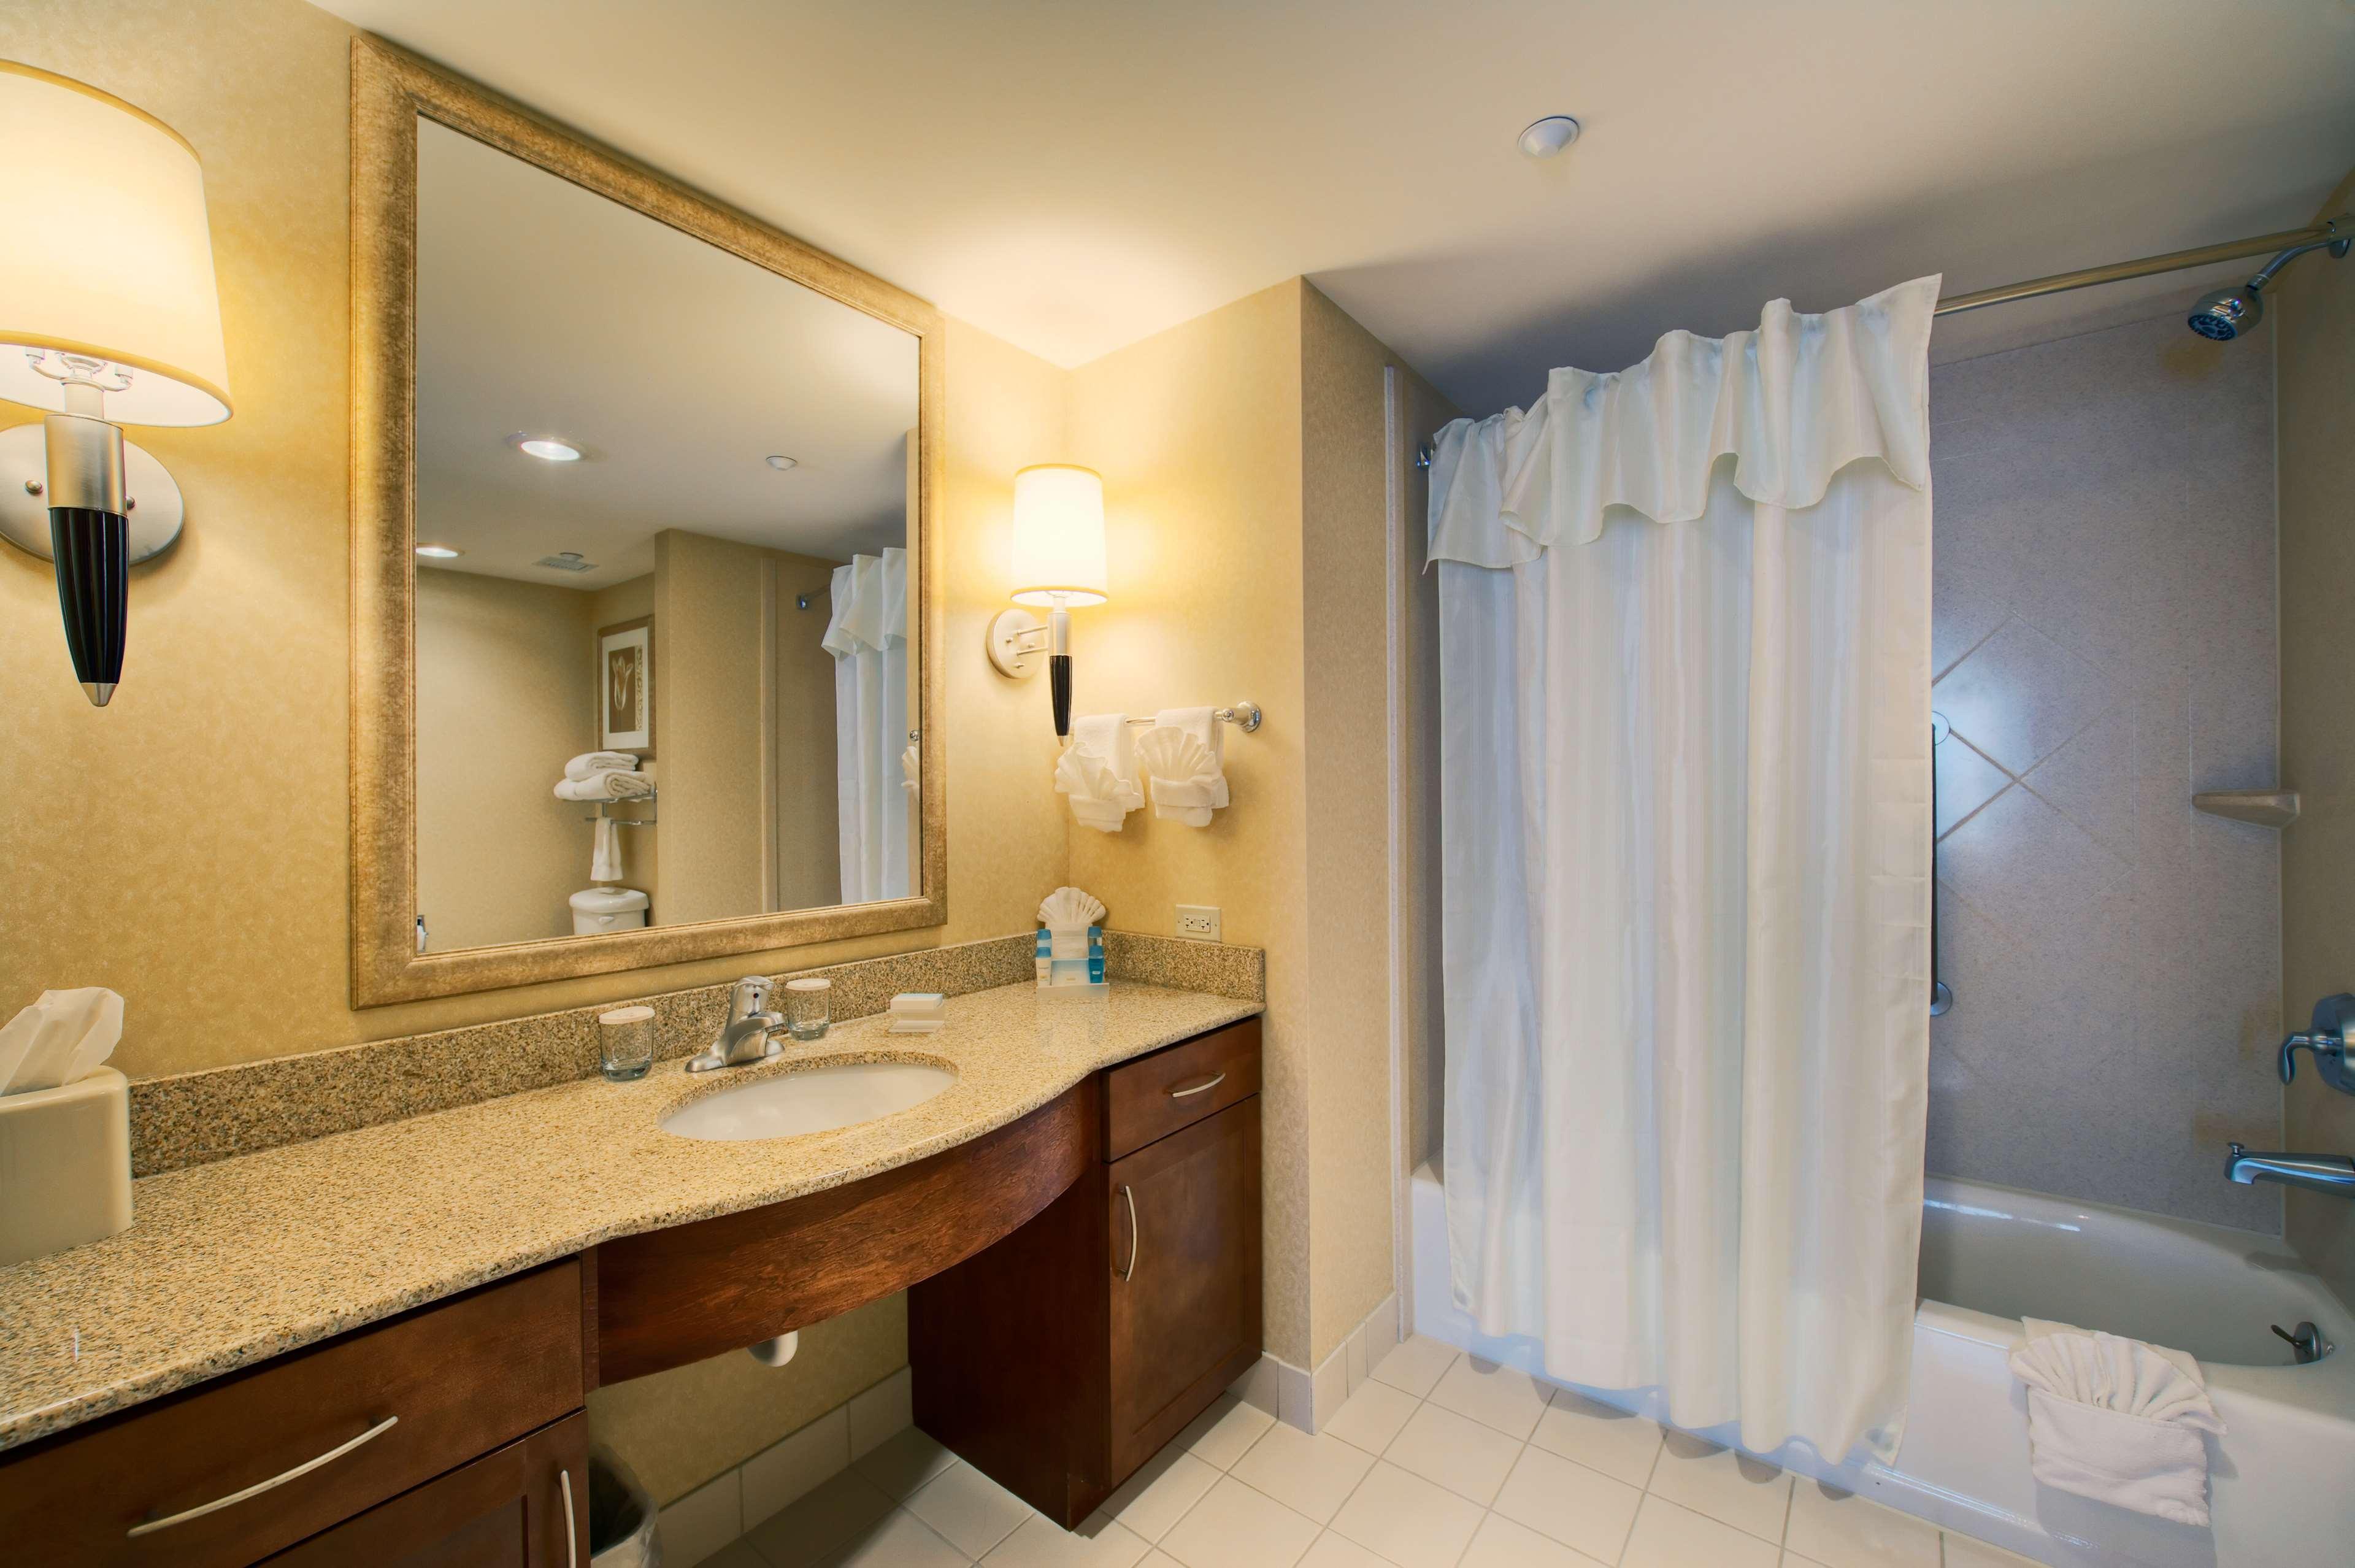 Homewood Suites by Hilton Orland Park image 25